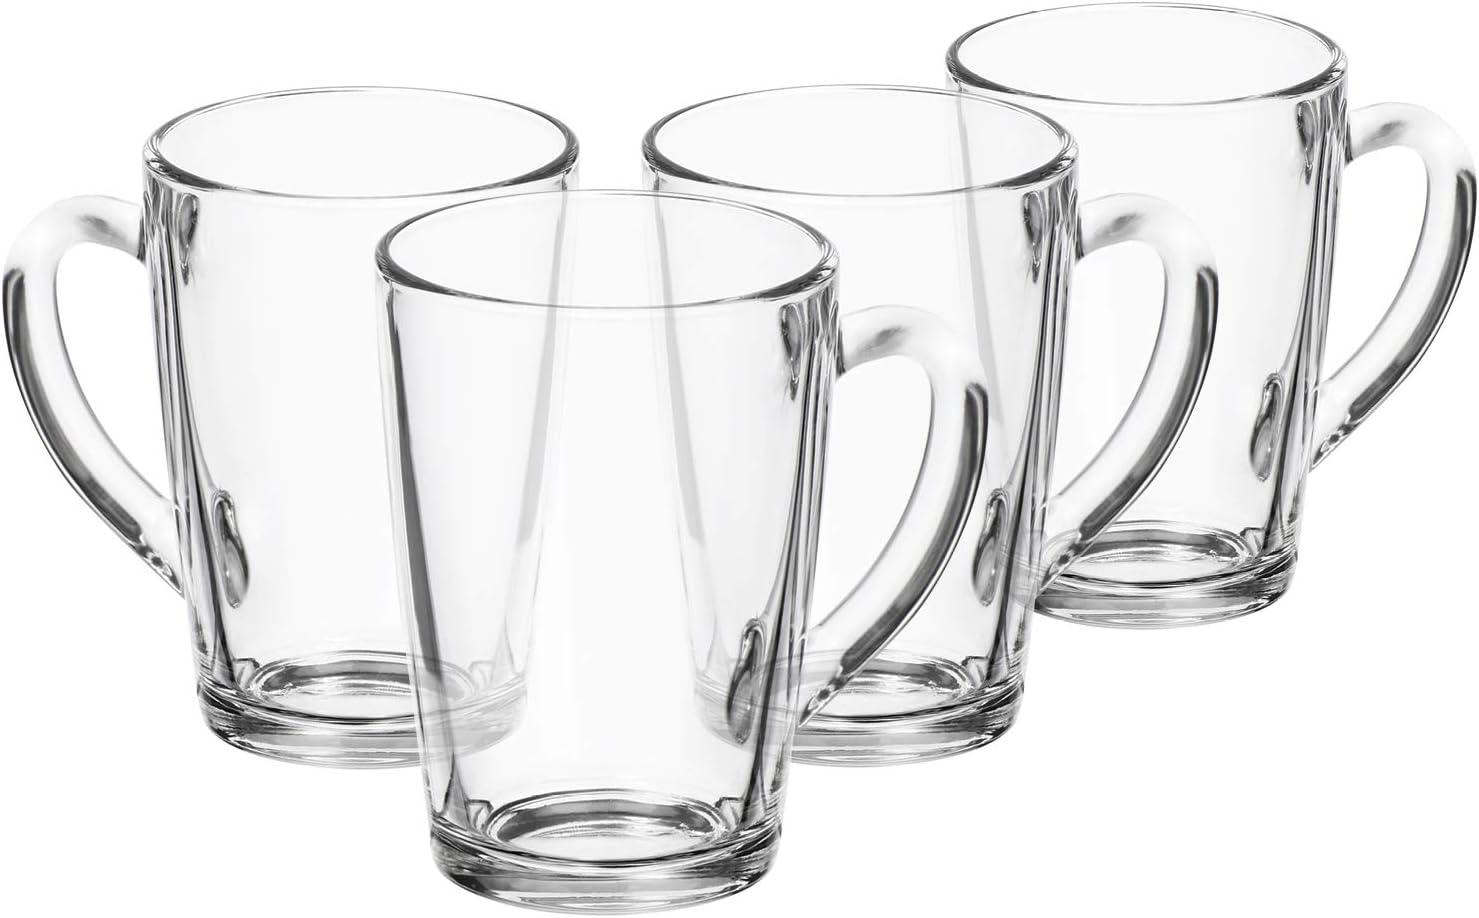 com-four® 4x Vaso de Té - Tazas de Vidrio con Mango - Ideal para Té, Chocolate Caliente, Café y Capuchino (04 piezas - 315ml)